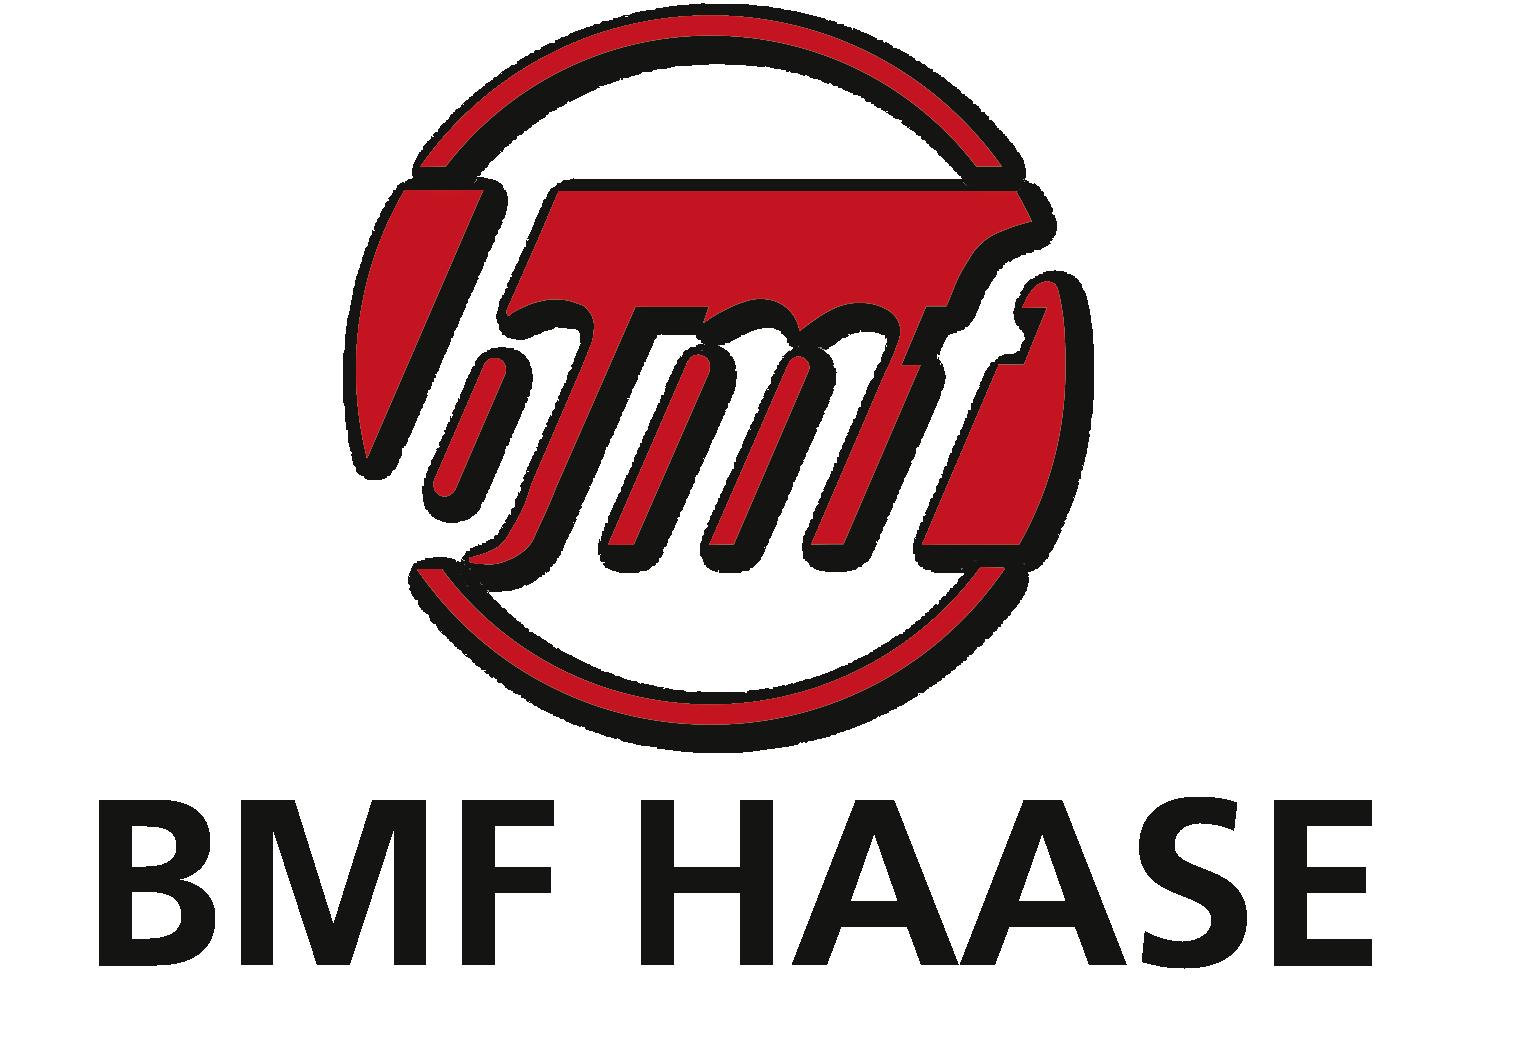 BMF HAASE